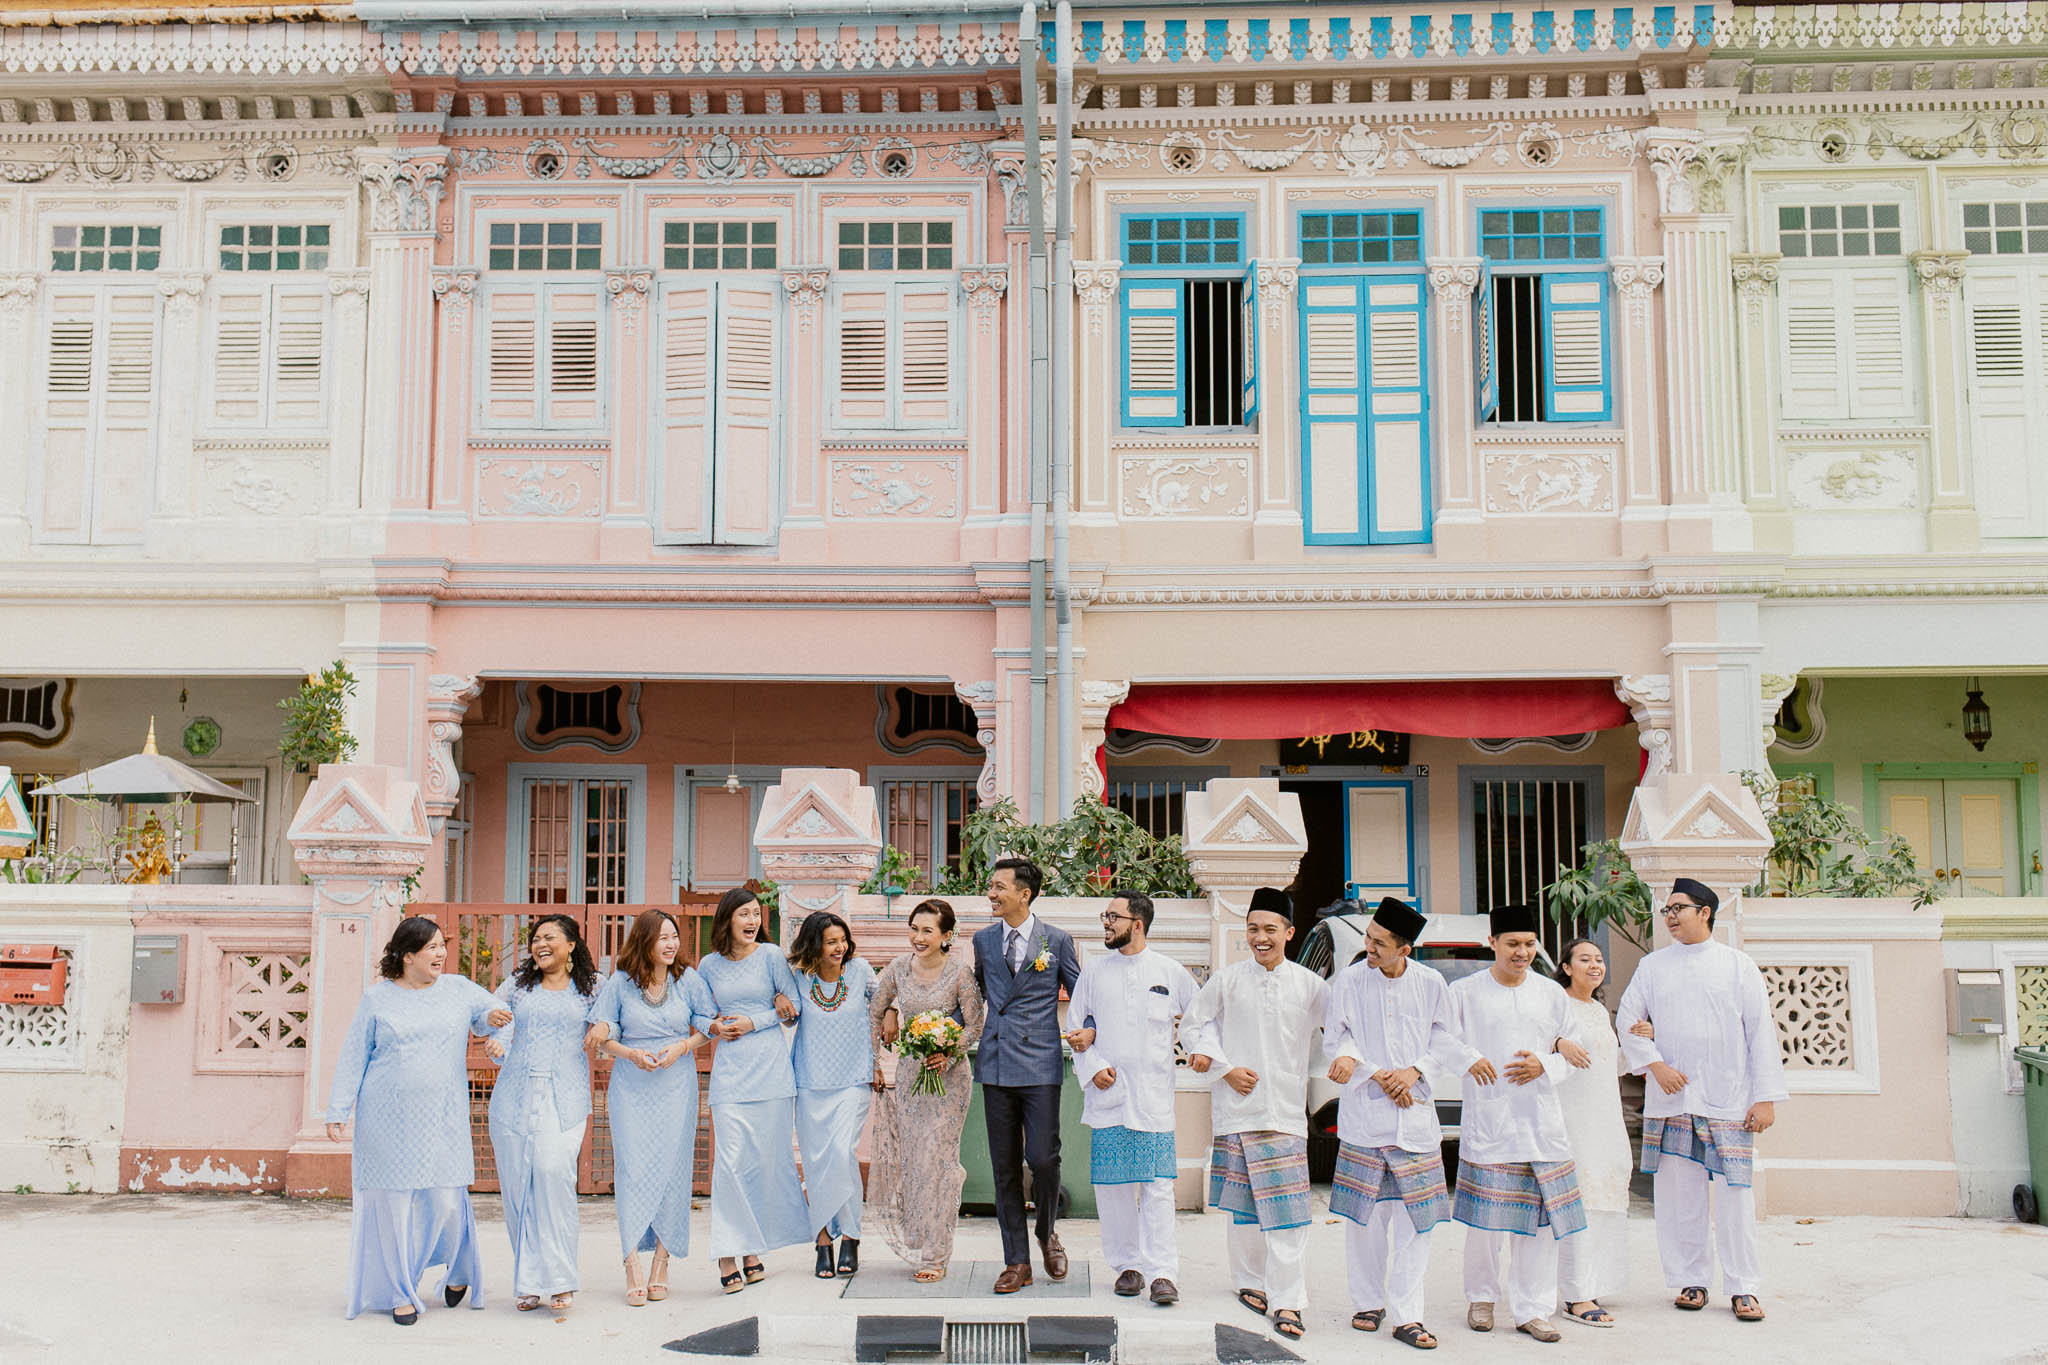 singapore-wedding-photographer-wedding-nufail-addafiq-071.jpg